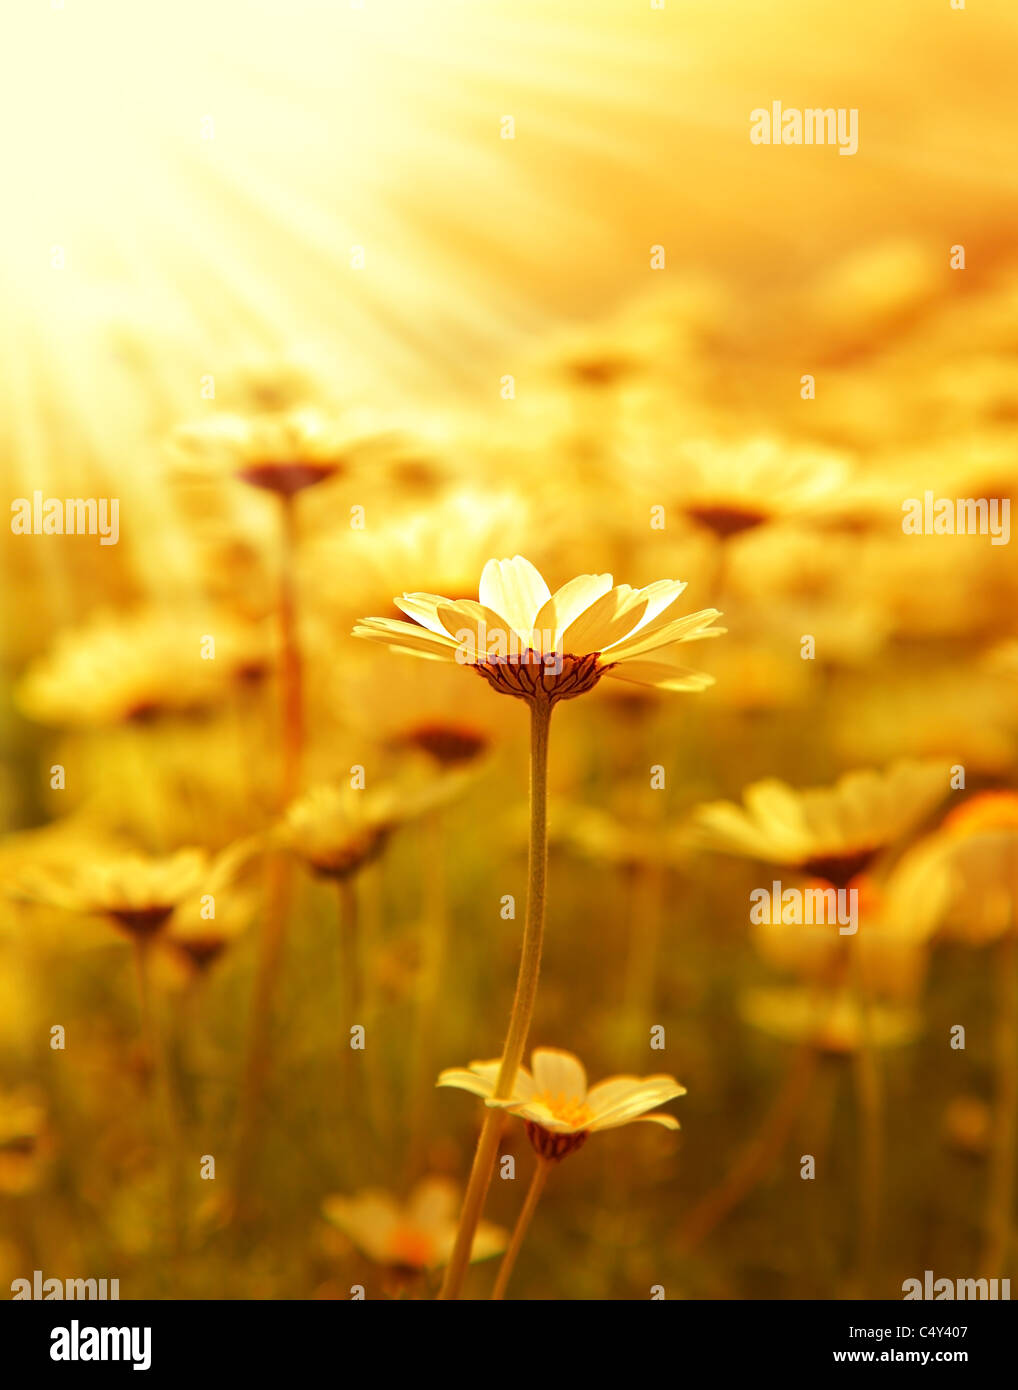 Frische Gänseblümchen Blume Feld Hintergrund am sonnigen Frühlingstag, Sonnenuntergang Makro-outdoor Stockbild